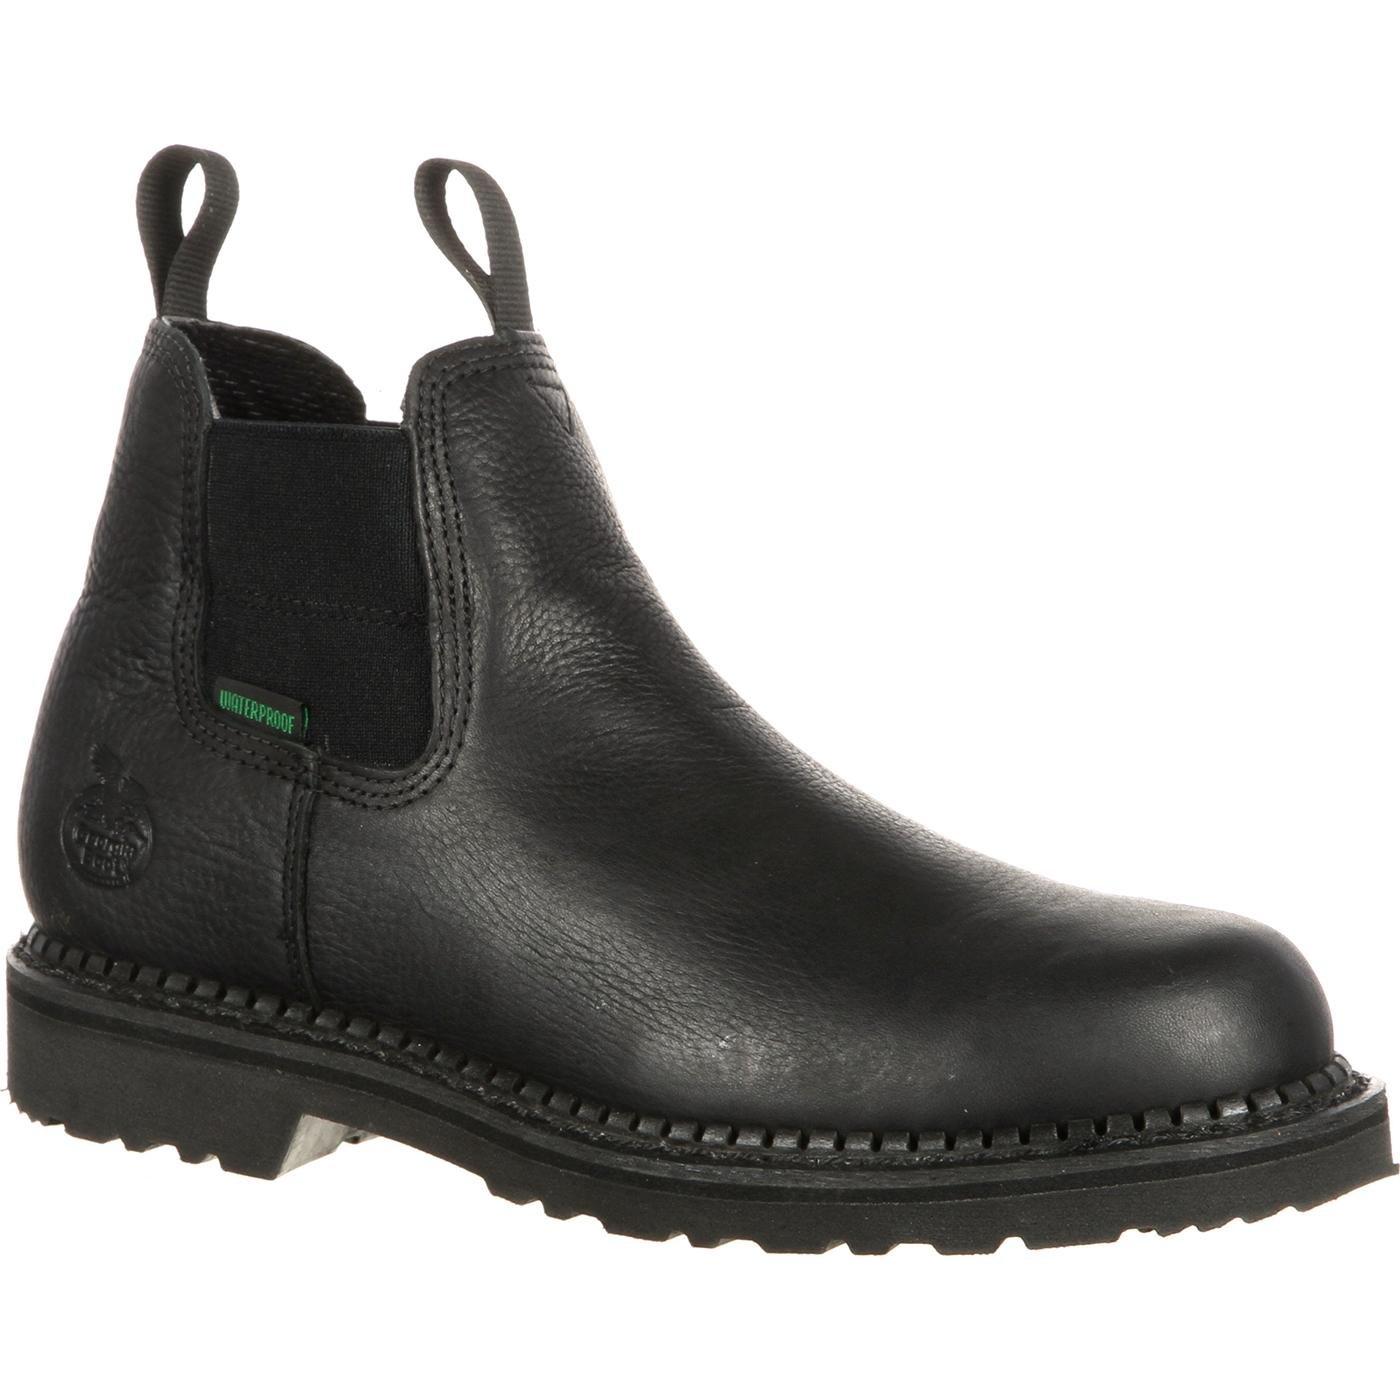 Georgia GB00084 Mid Calf Boot,black,8.5 M US